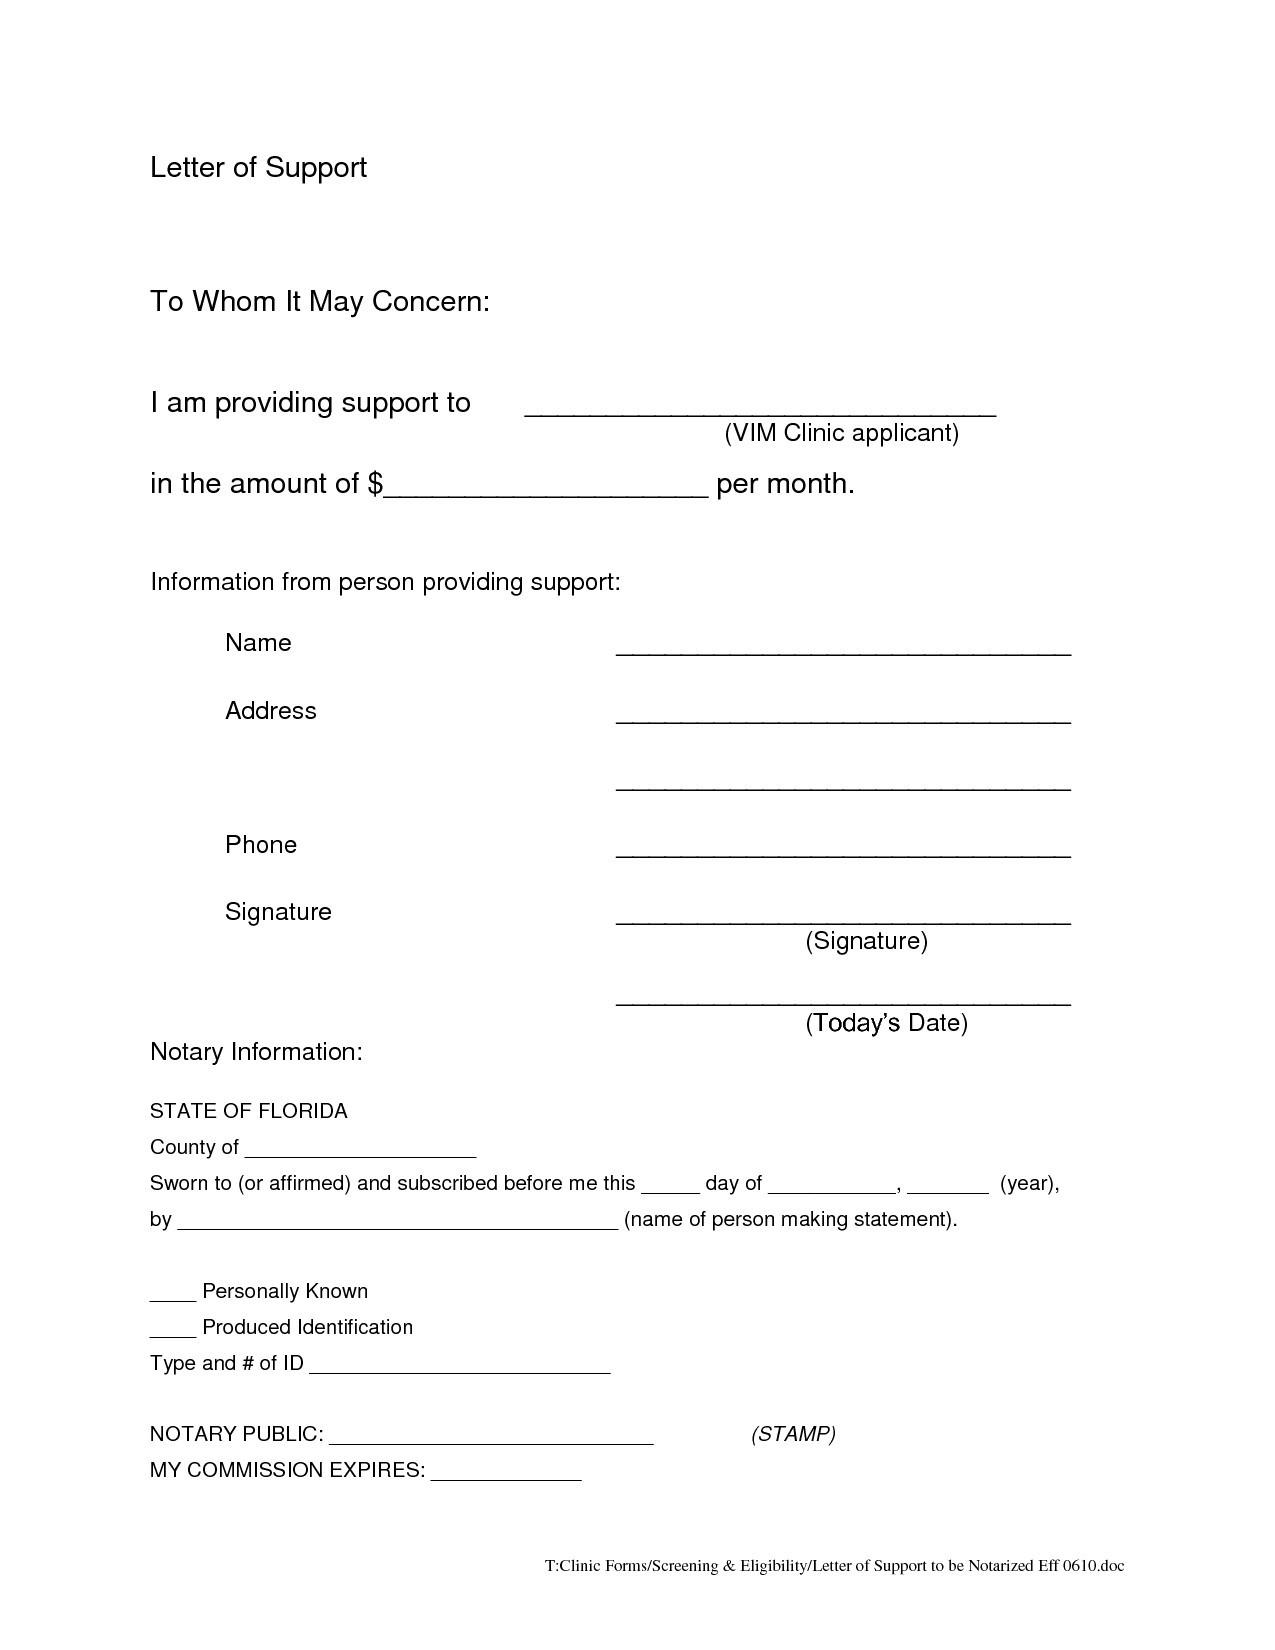 Printable Notarized Letter Of Residency Template - How to Notarize A Letter Printable Notarized Letter Residency